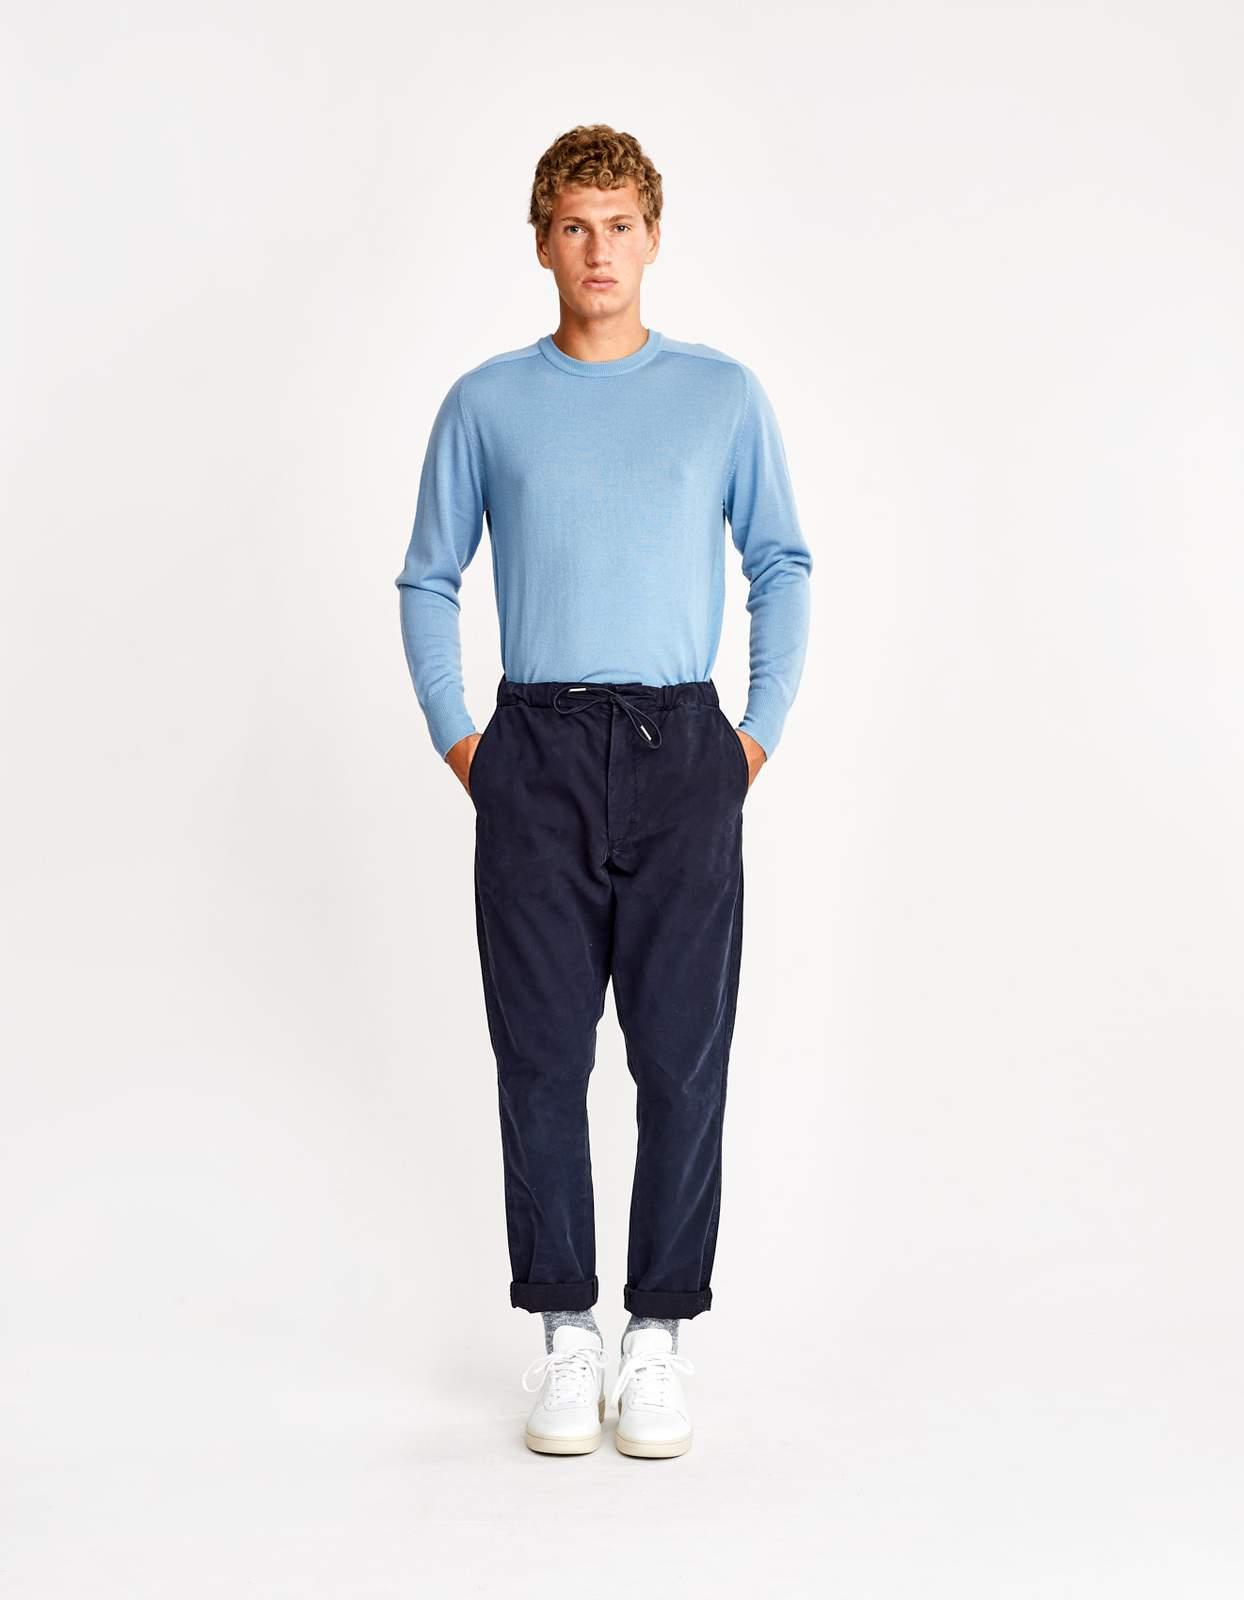 BLR-pants-pogg-r0688-america_21_1600x1600.jpg